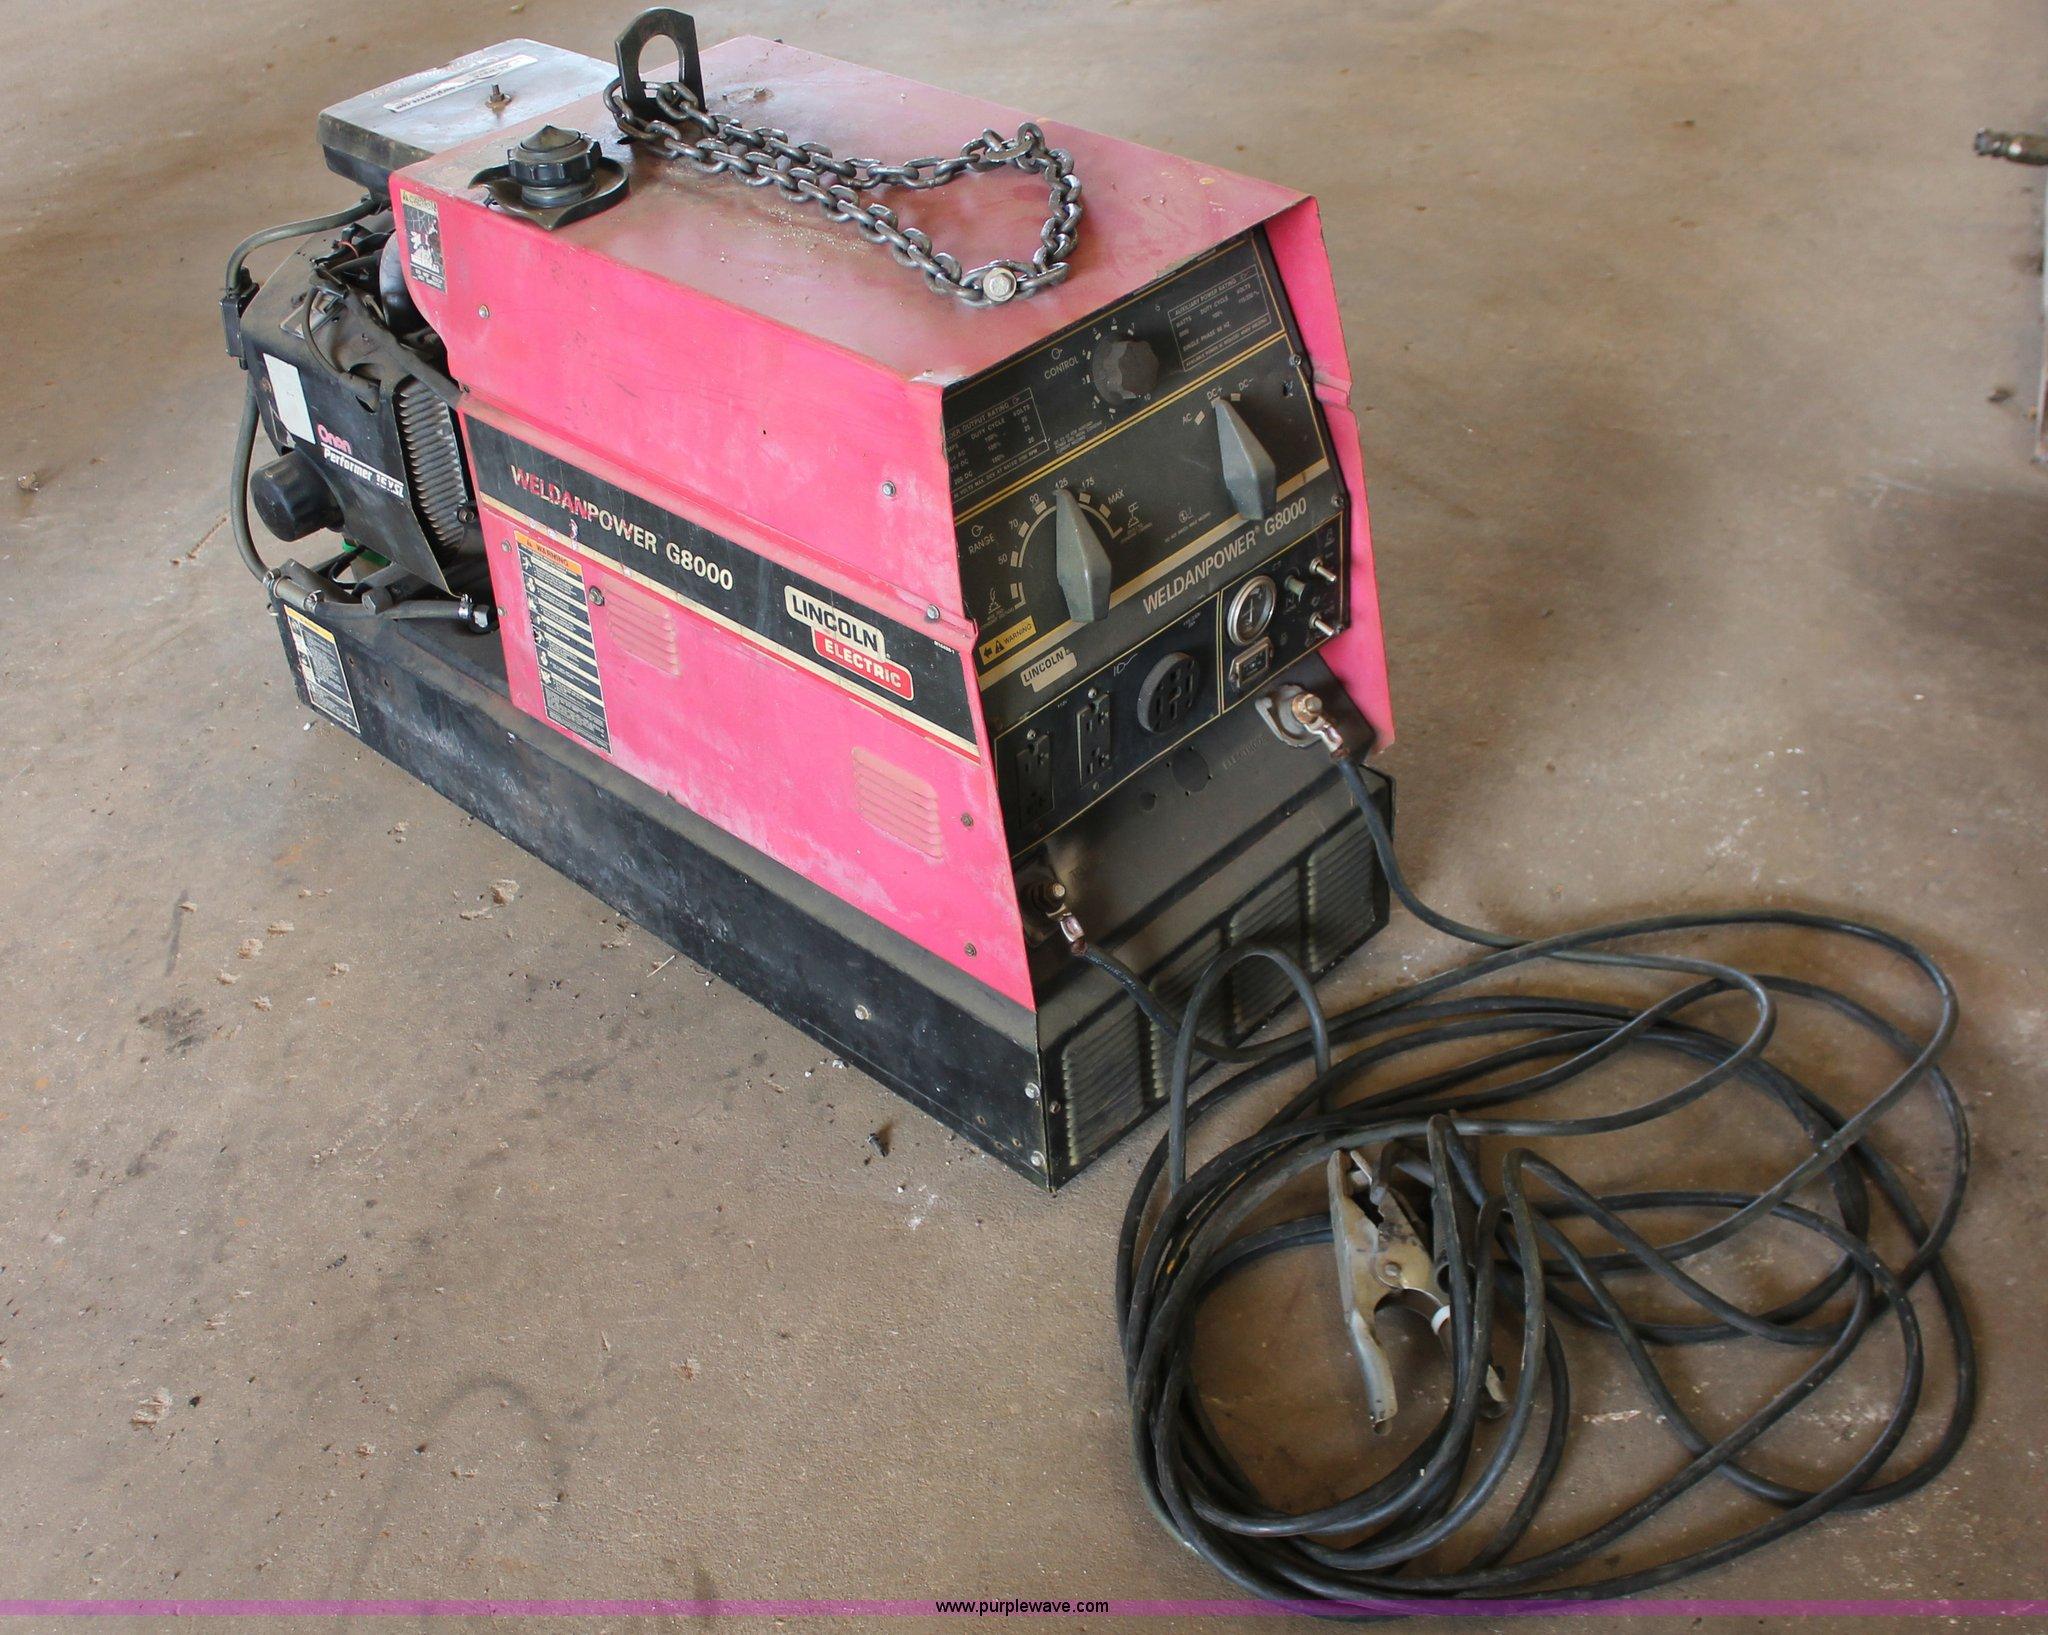 Lincoln Weldanpower G8000 Wiring Diagram Not Lossing 225 Welder Generator Item Ao9456 S Rh Purplewave Com Specs 1993